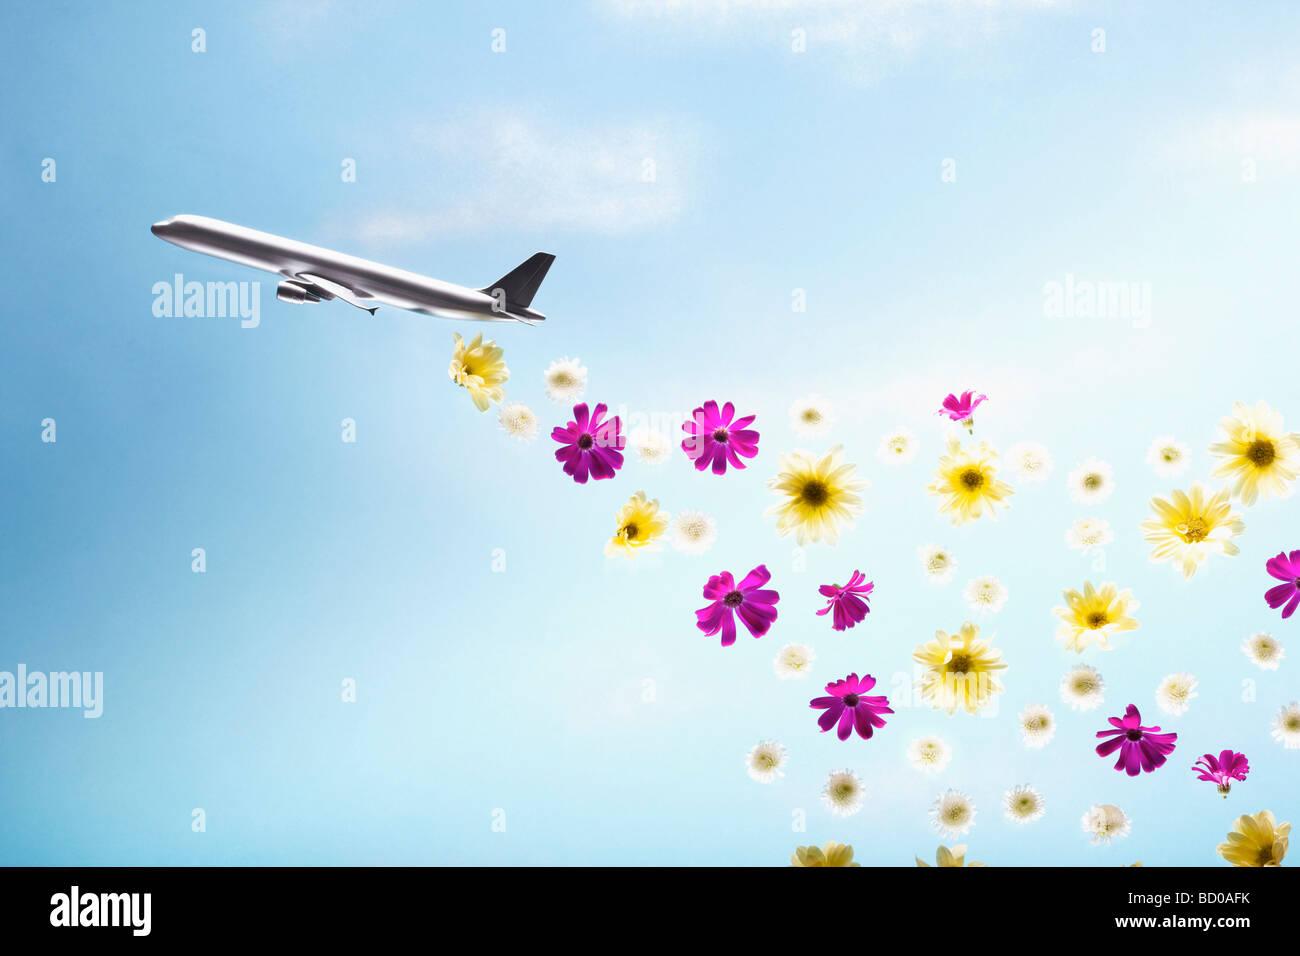 A plane emitting flowers - Stock Image